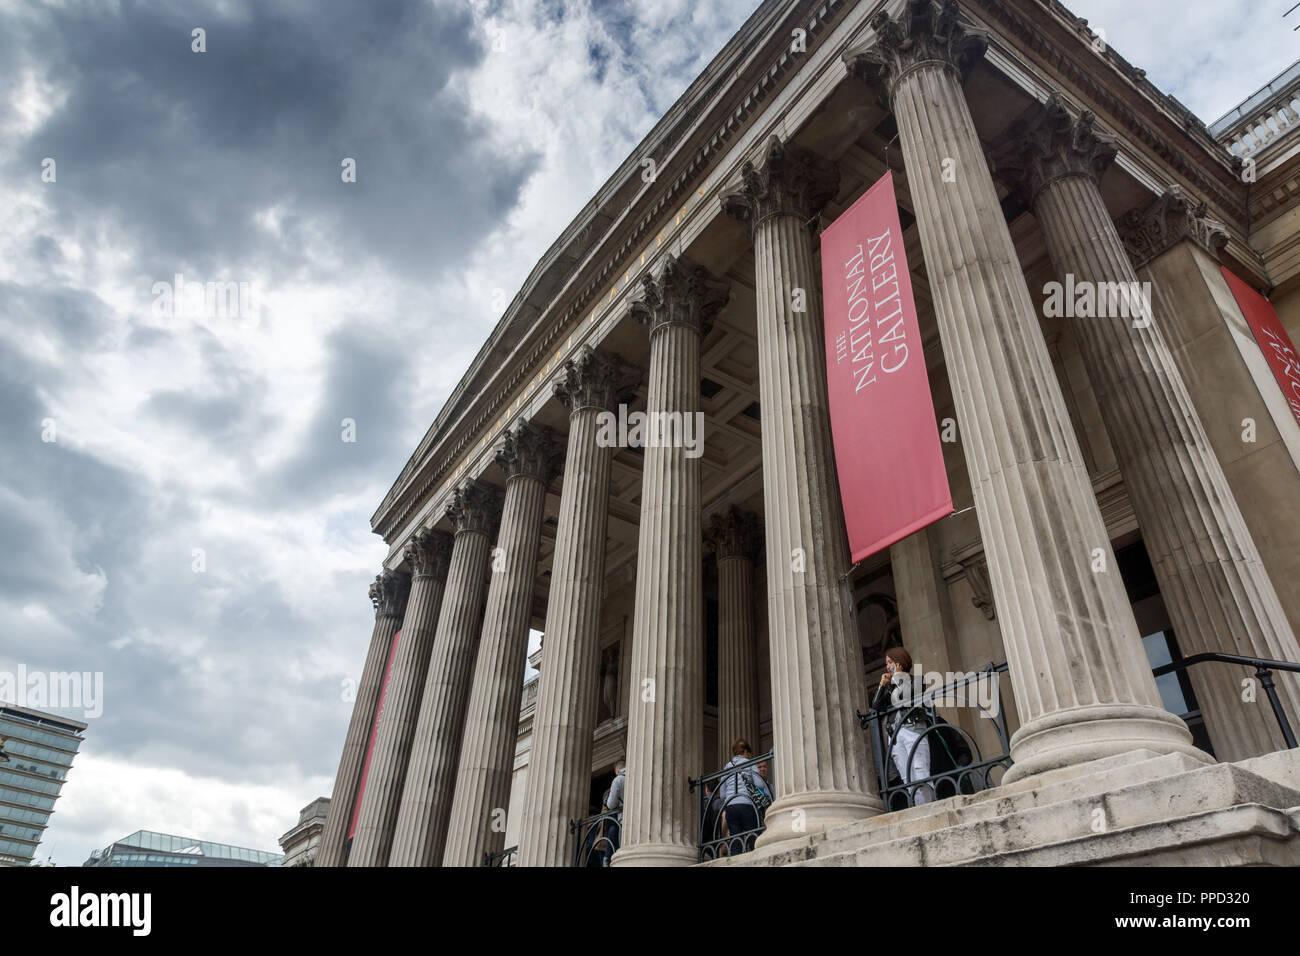 LONDON, ENGLAND - JUNE 16 2016: The National Gallery on Trafalgar Square, London, England, United Kingdom Stock Photo